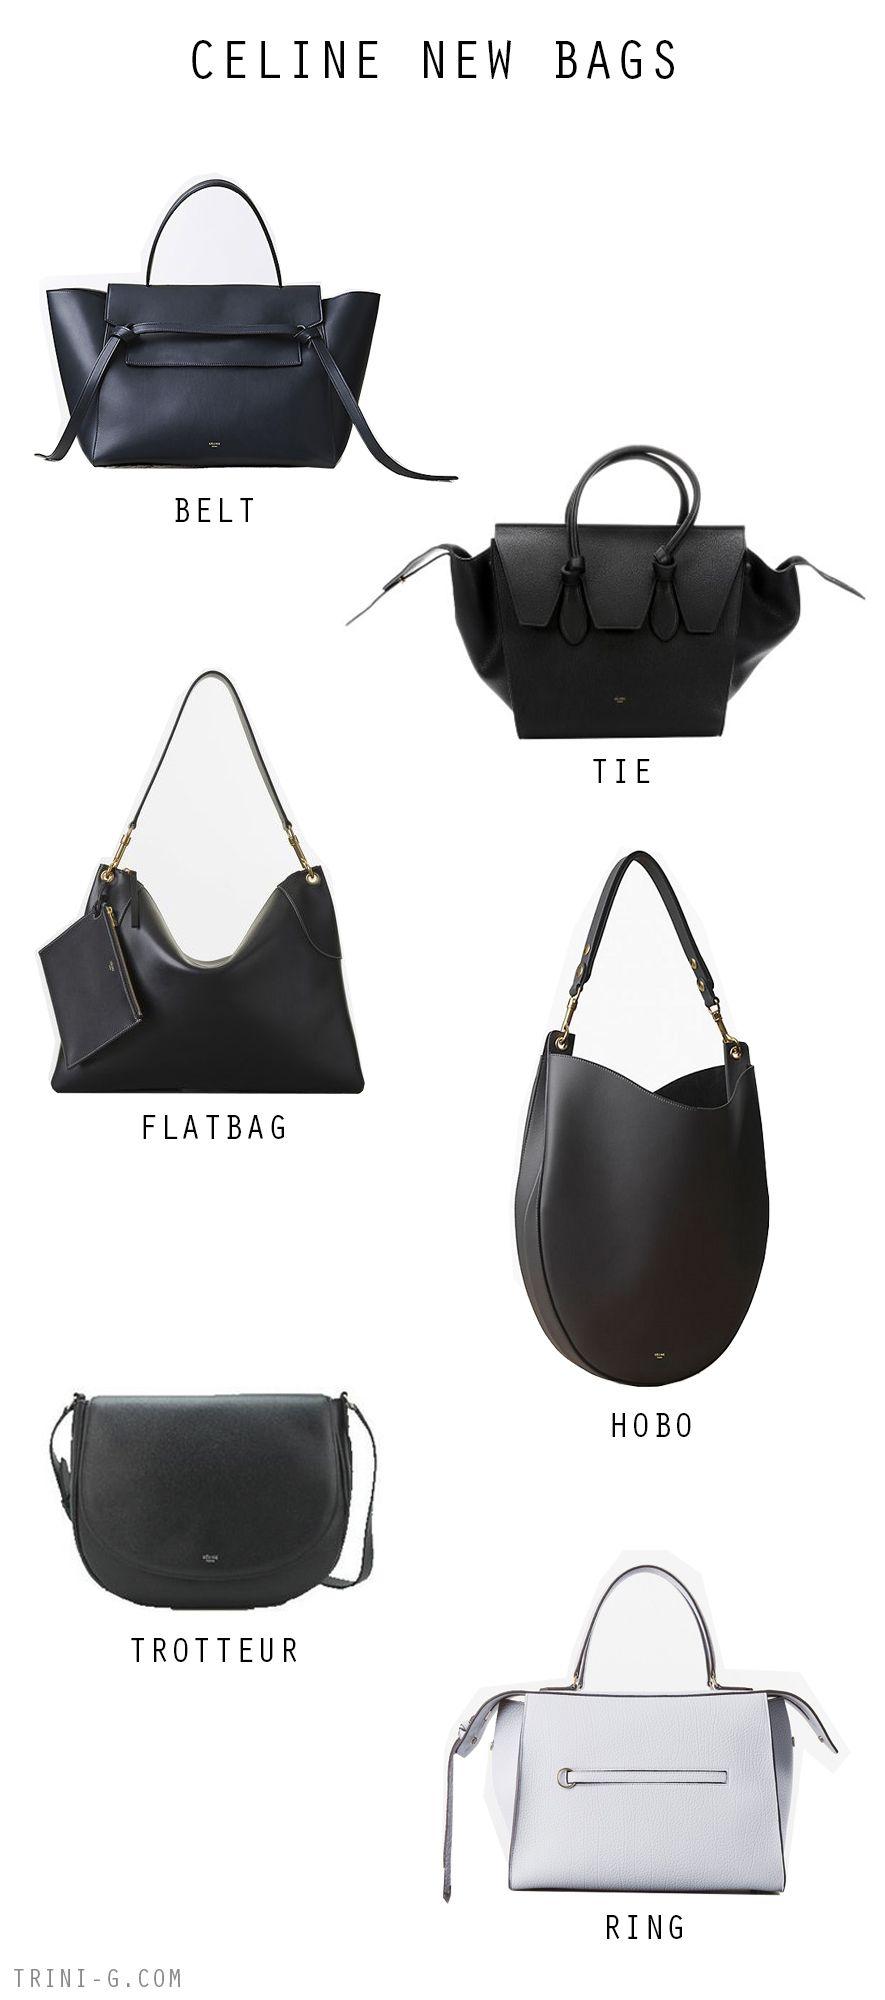 Trini blog   Celine newer bags Clothing, Shoes   Jewelry   Women   Handbags    4f81535a8e